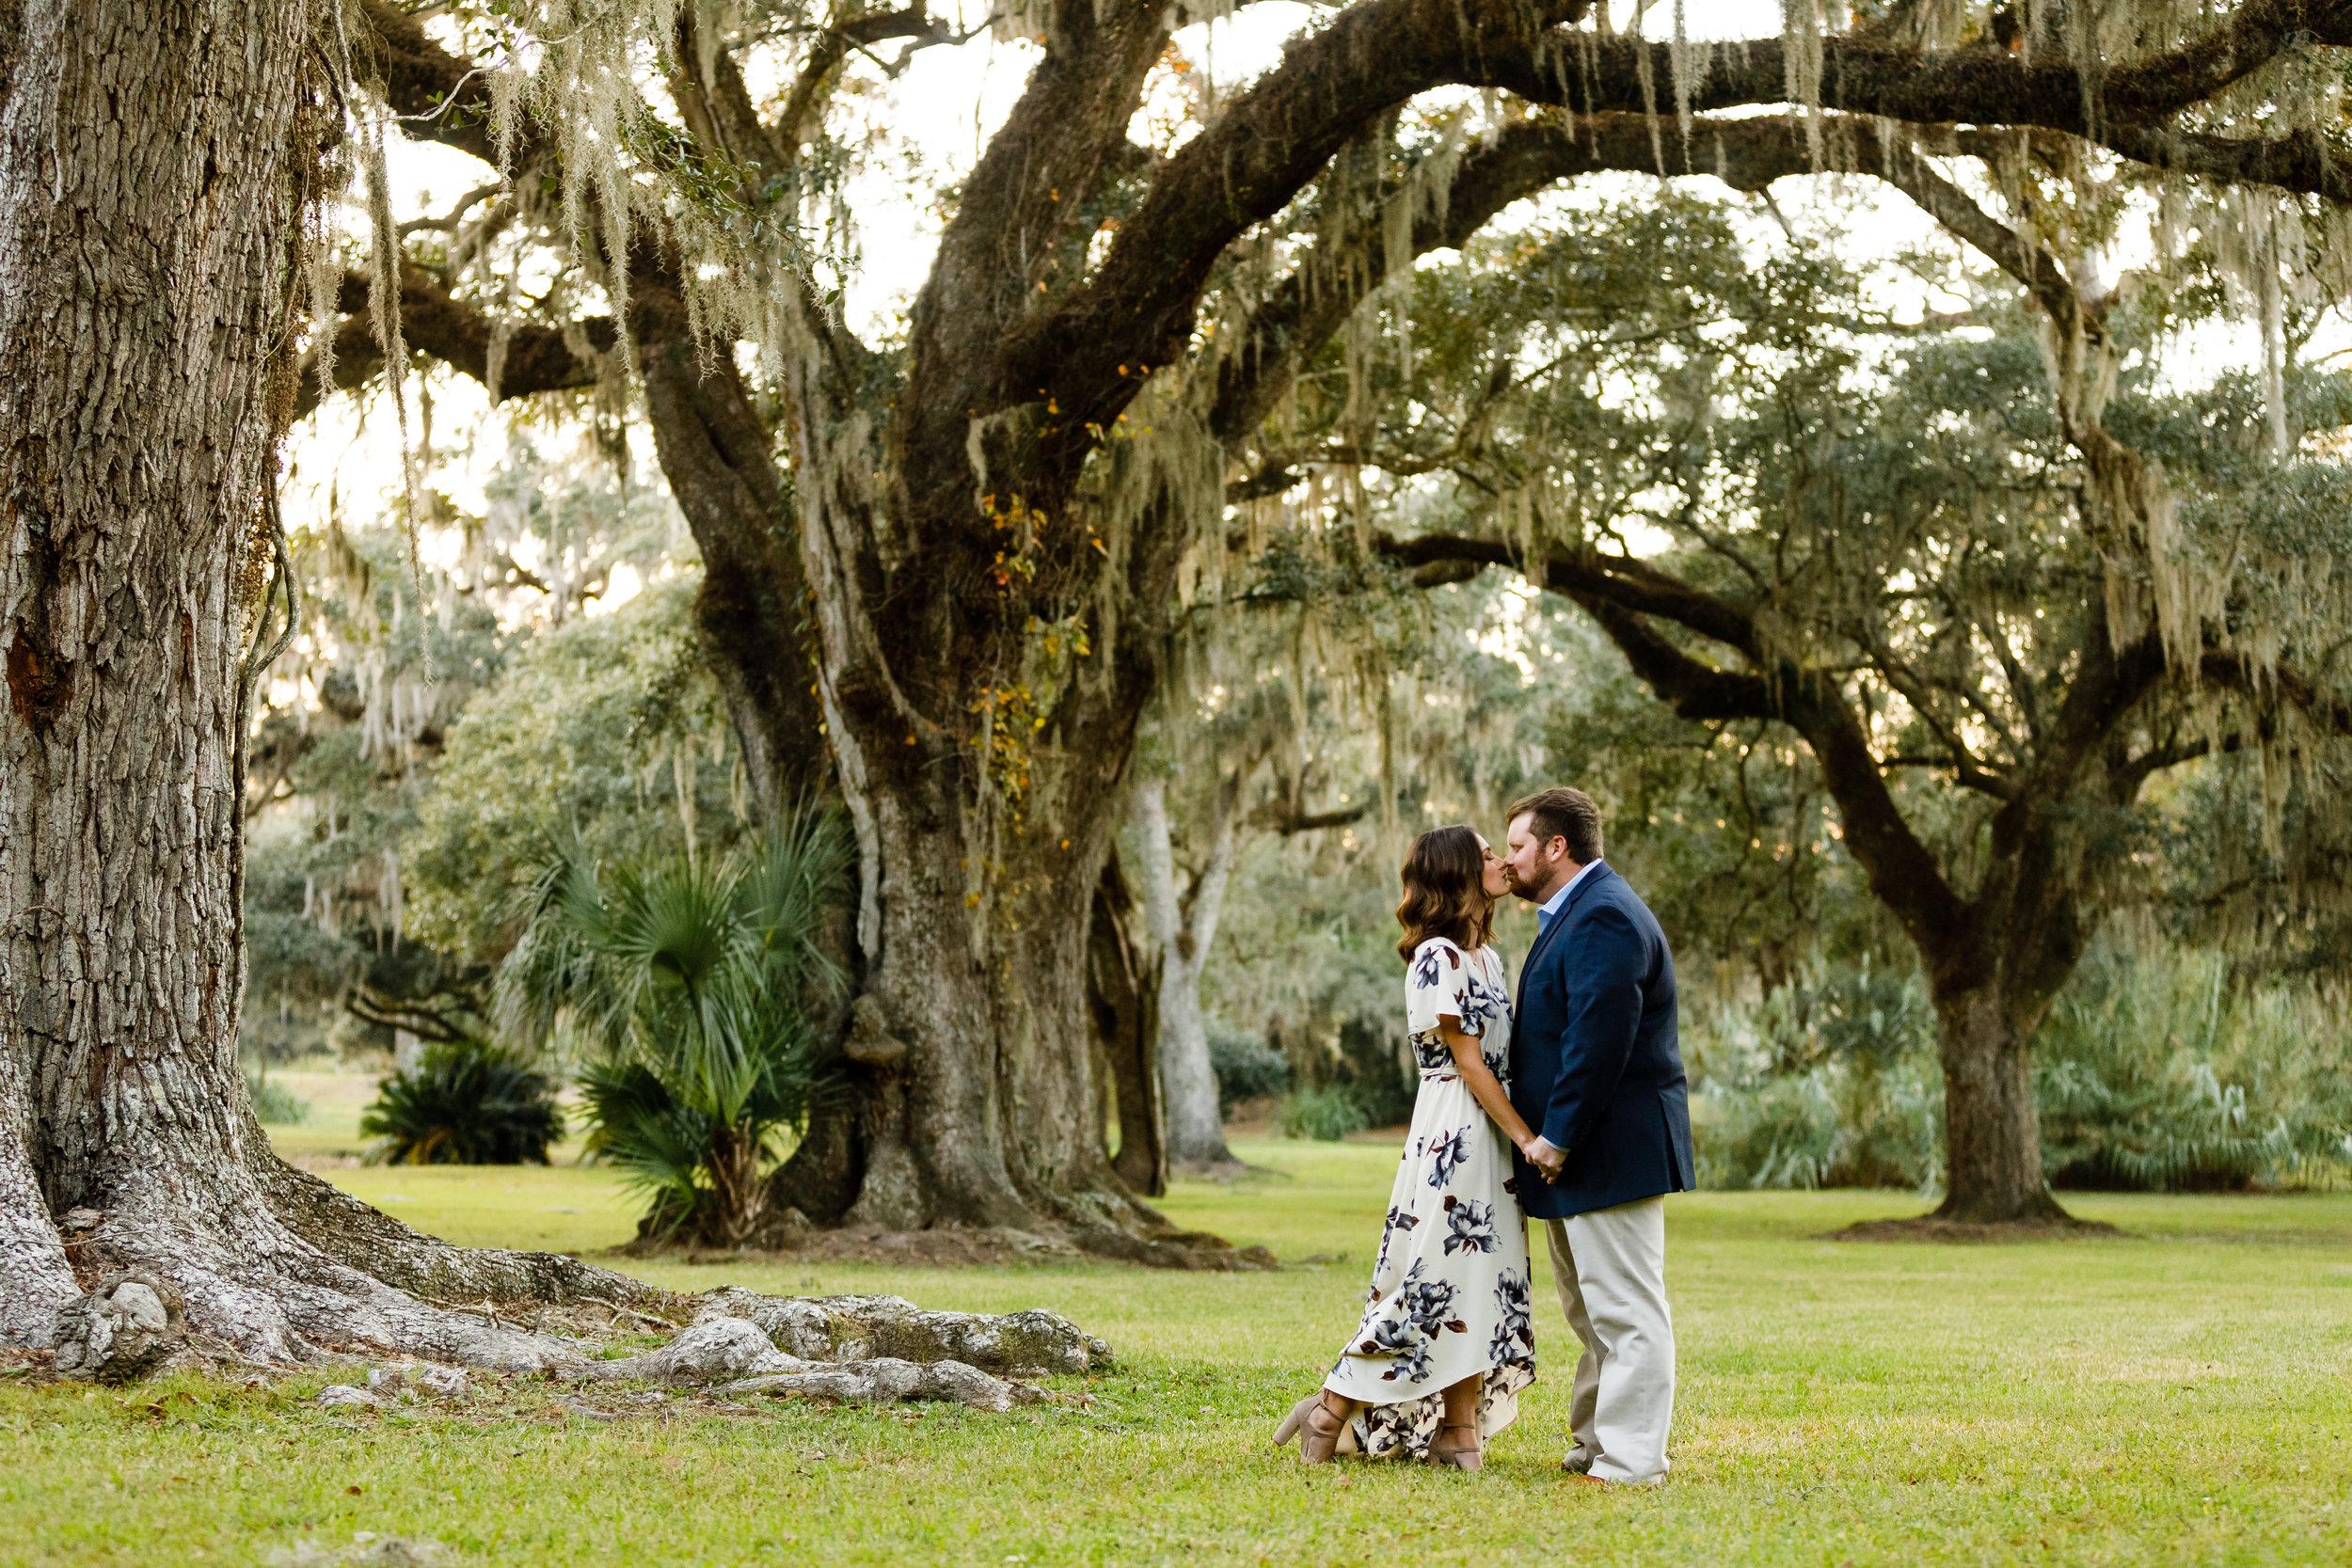 Youngsville-lafayette-portrait-family-wedding-photographer-0594.jpg